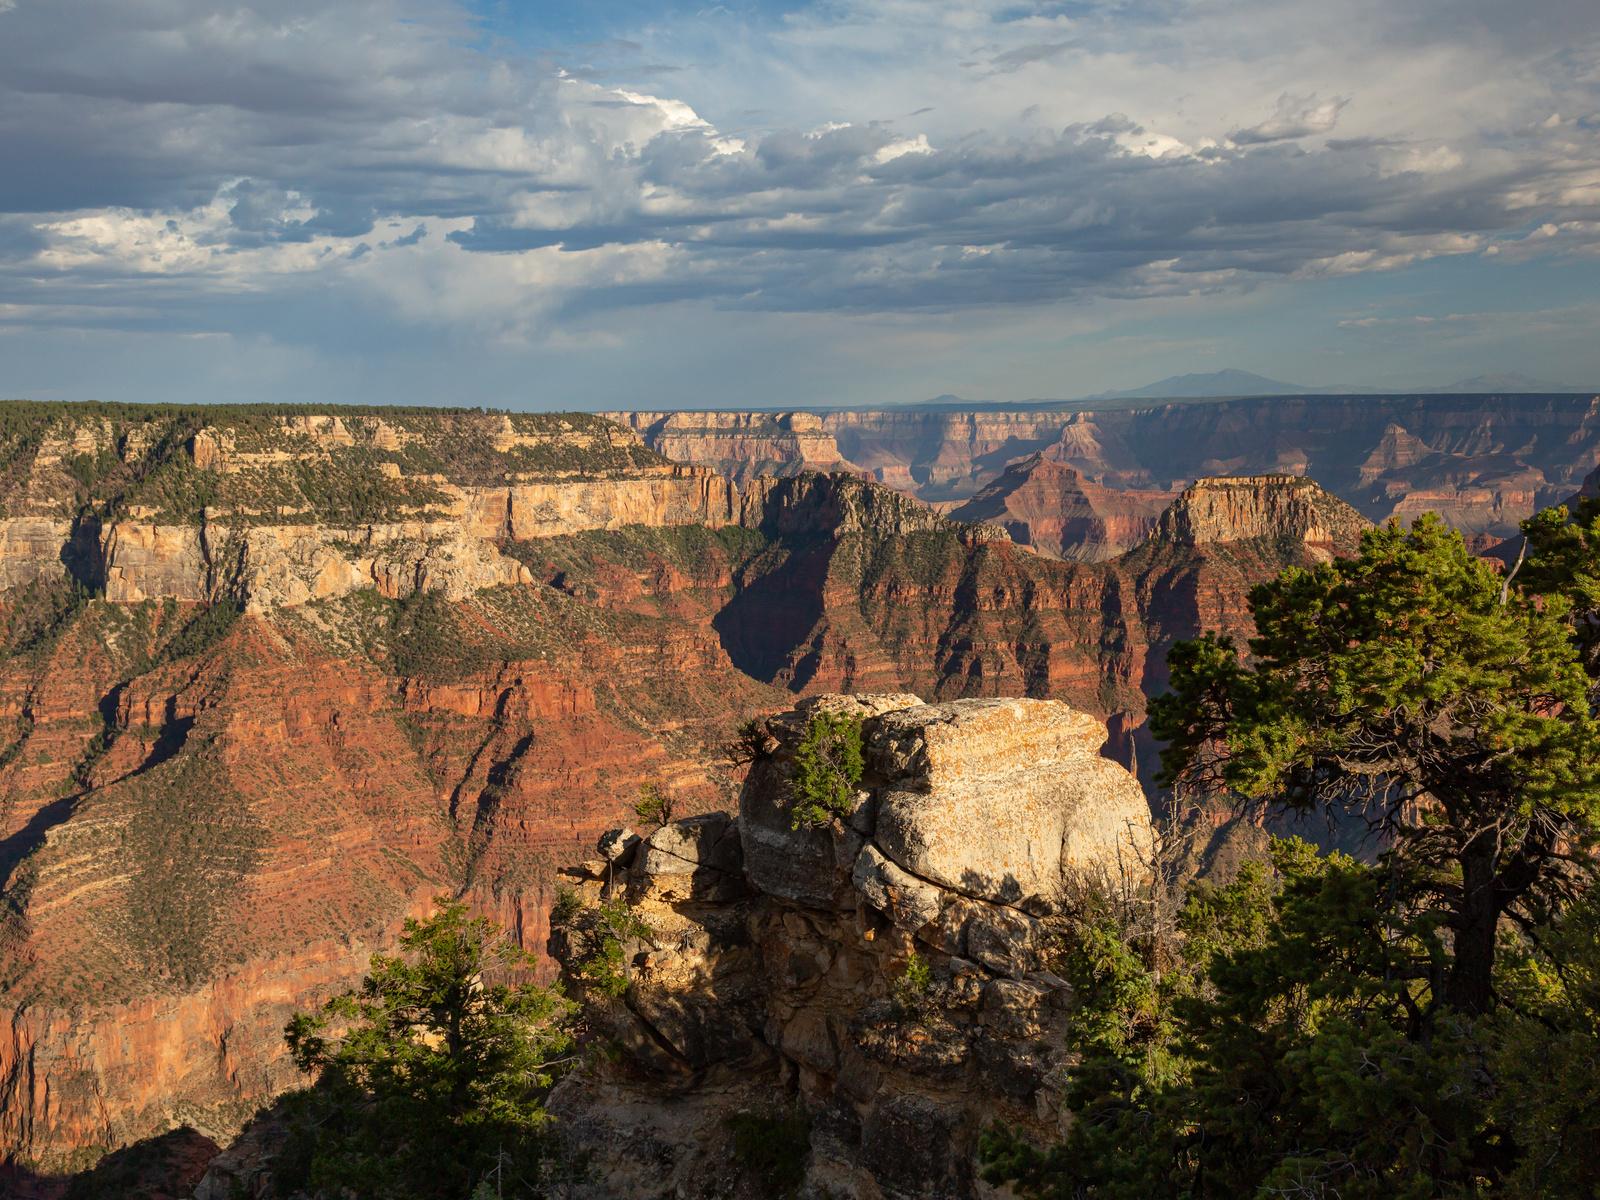 гранд-каньон, arizona, каньон, скала, природа